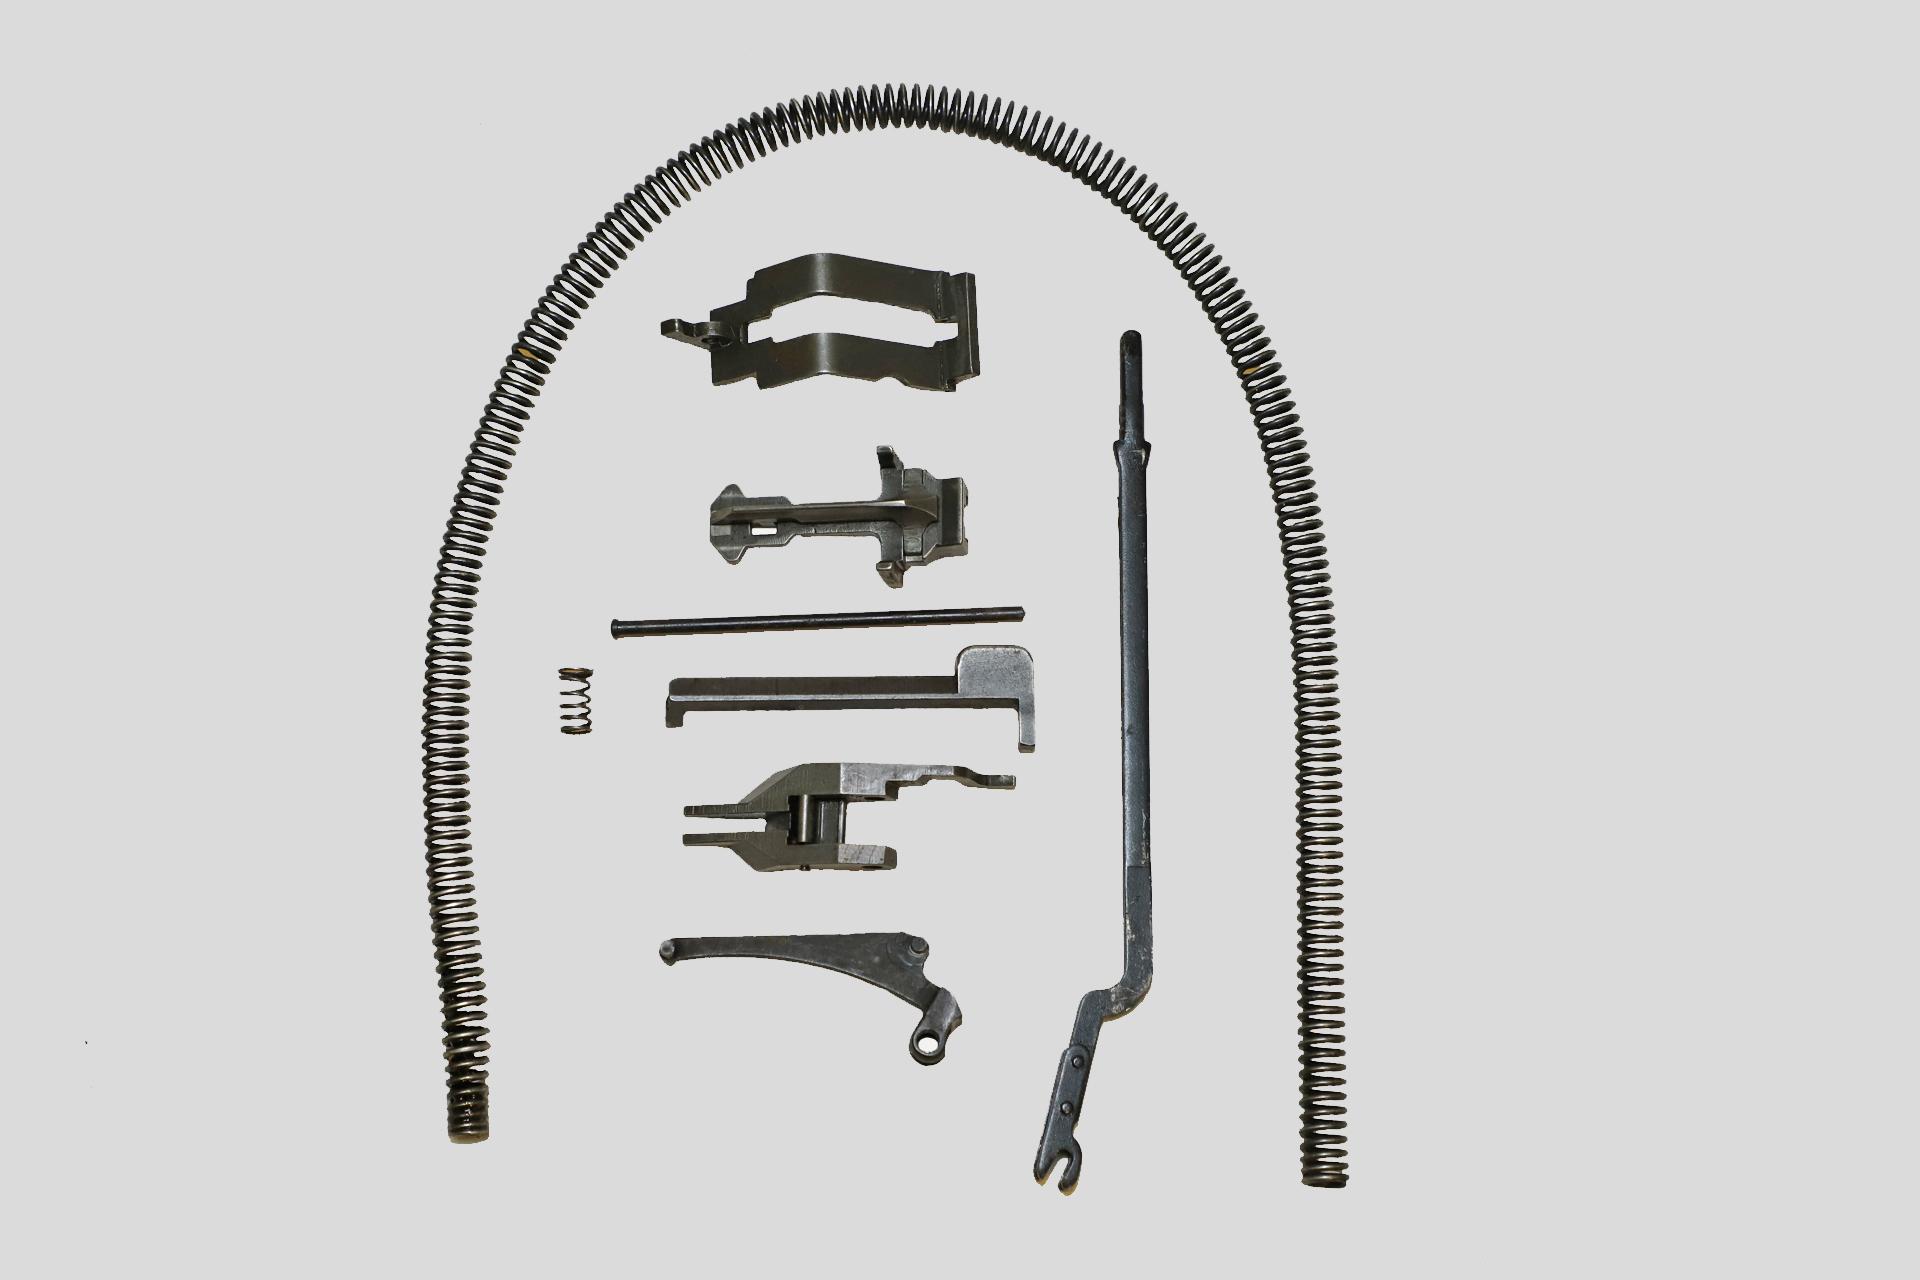 M1 Rifle Receiver Internal Parts Kit